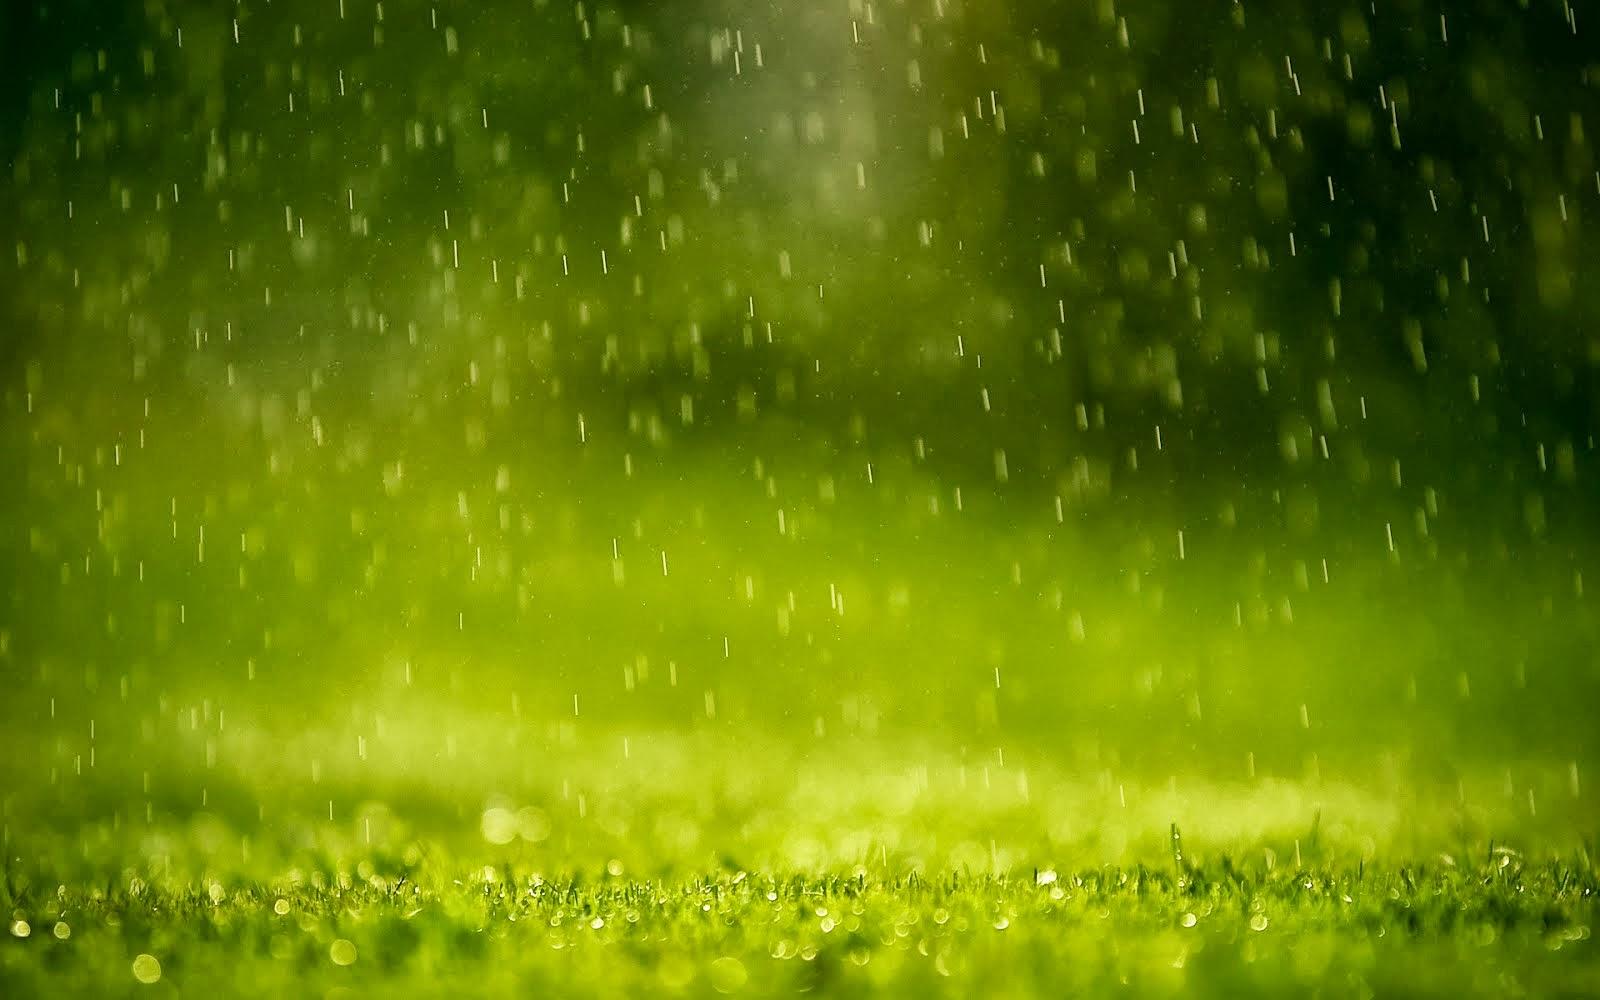 anime rain green wallpaper - photo #29